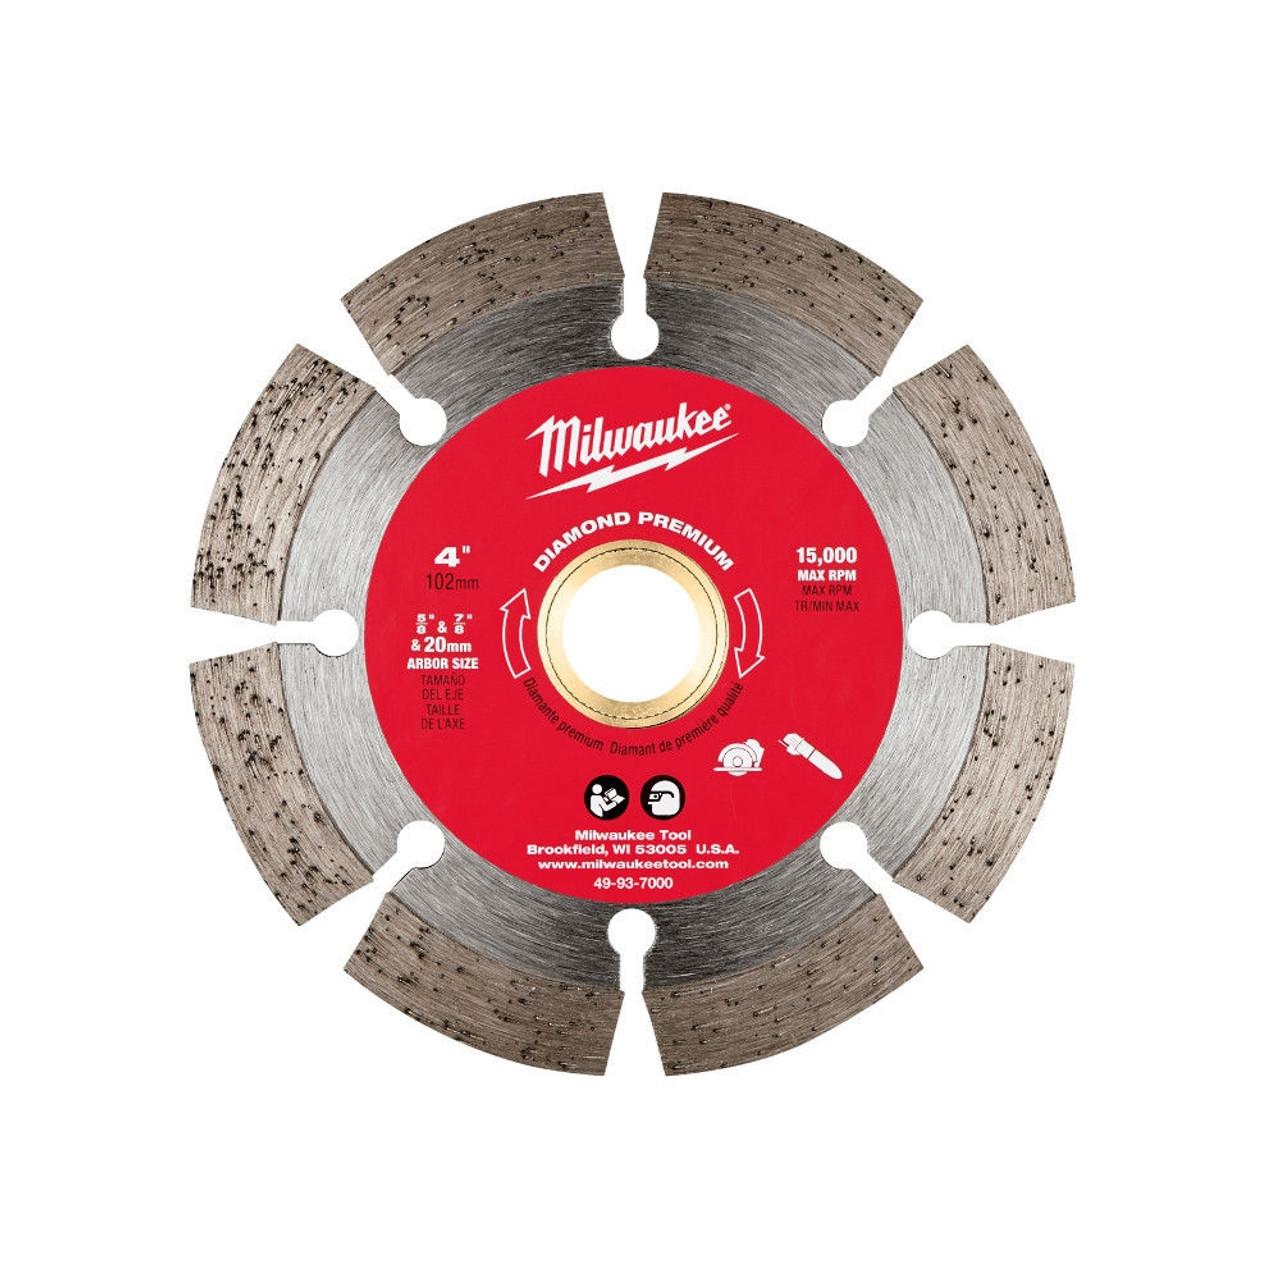 Milwaukee 49-93-7000 4 in. Diamond Premium Segmented Saw Blade